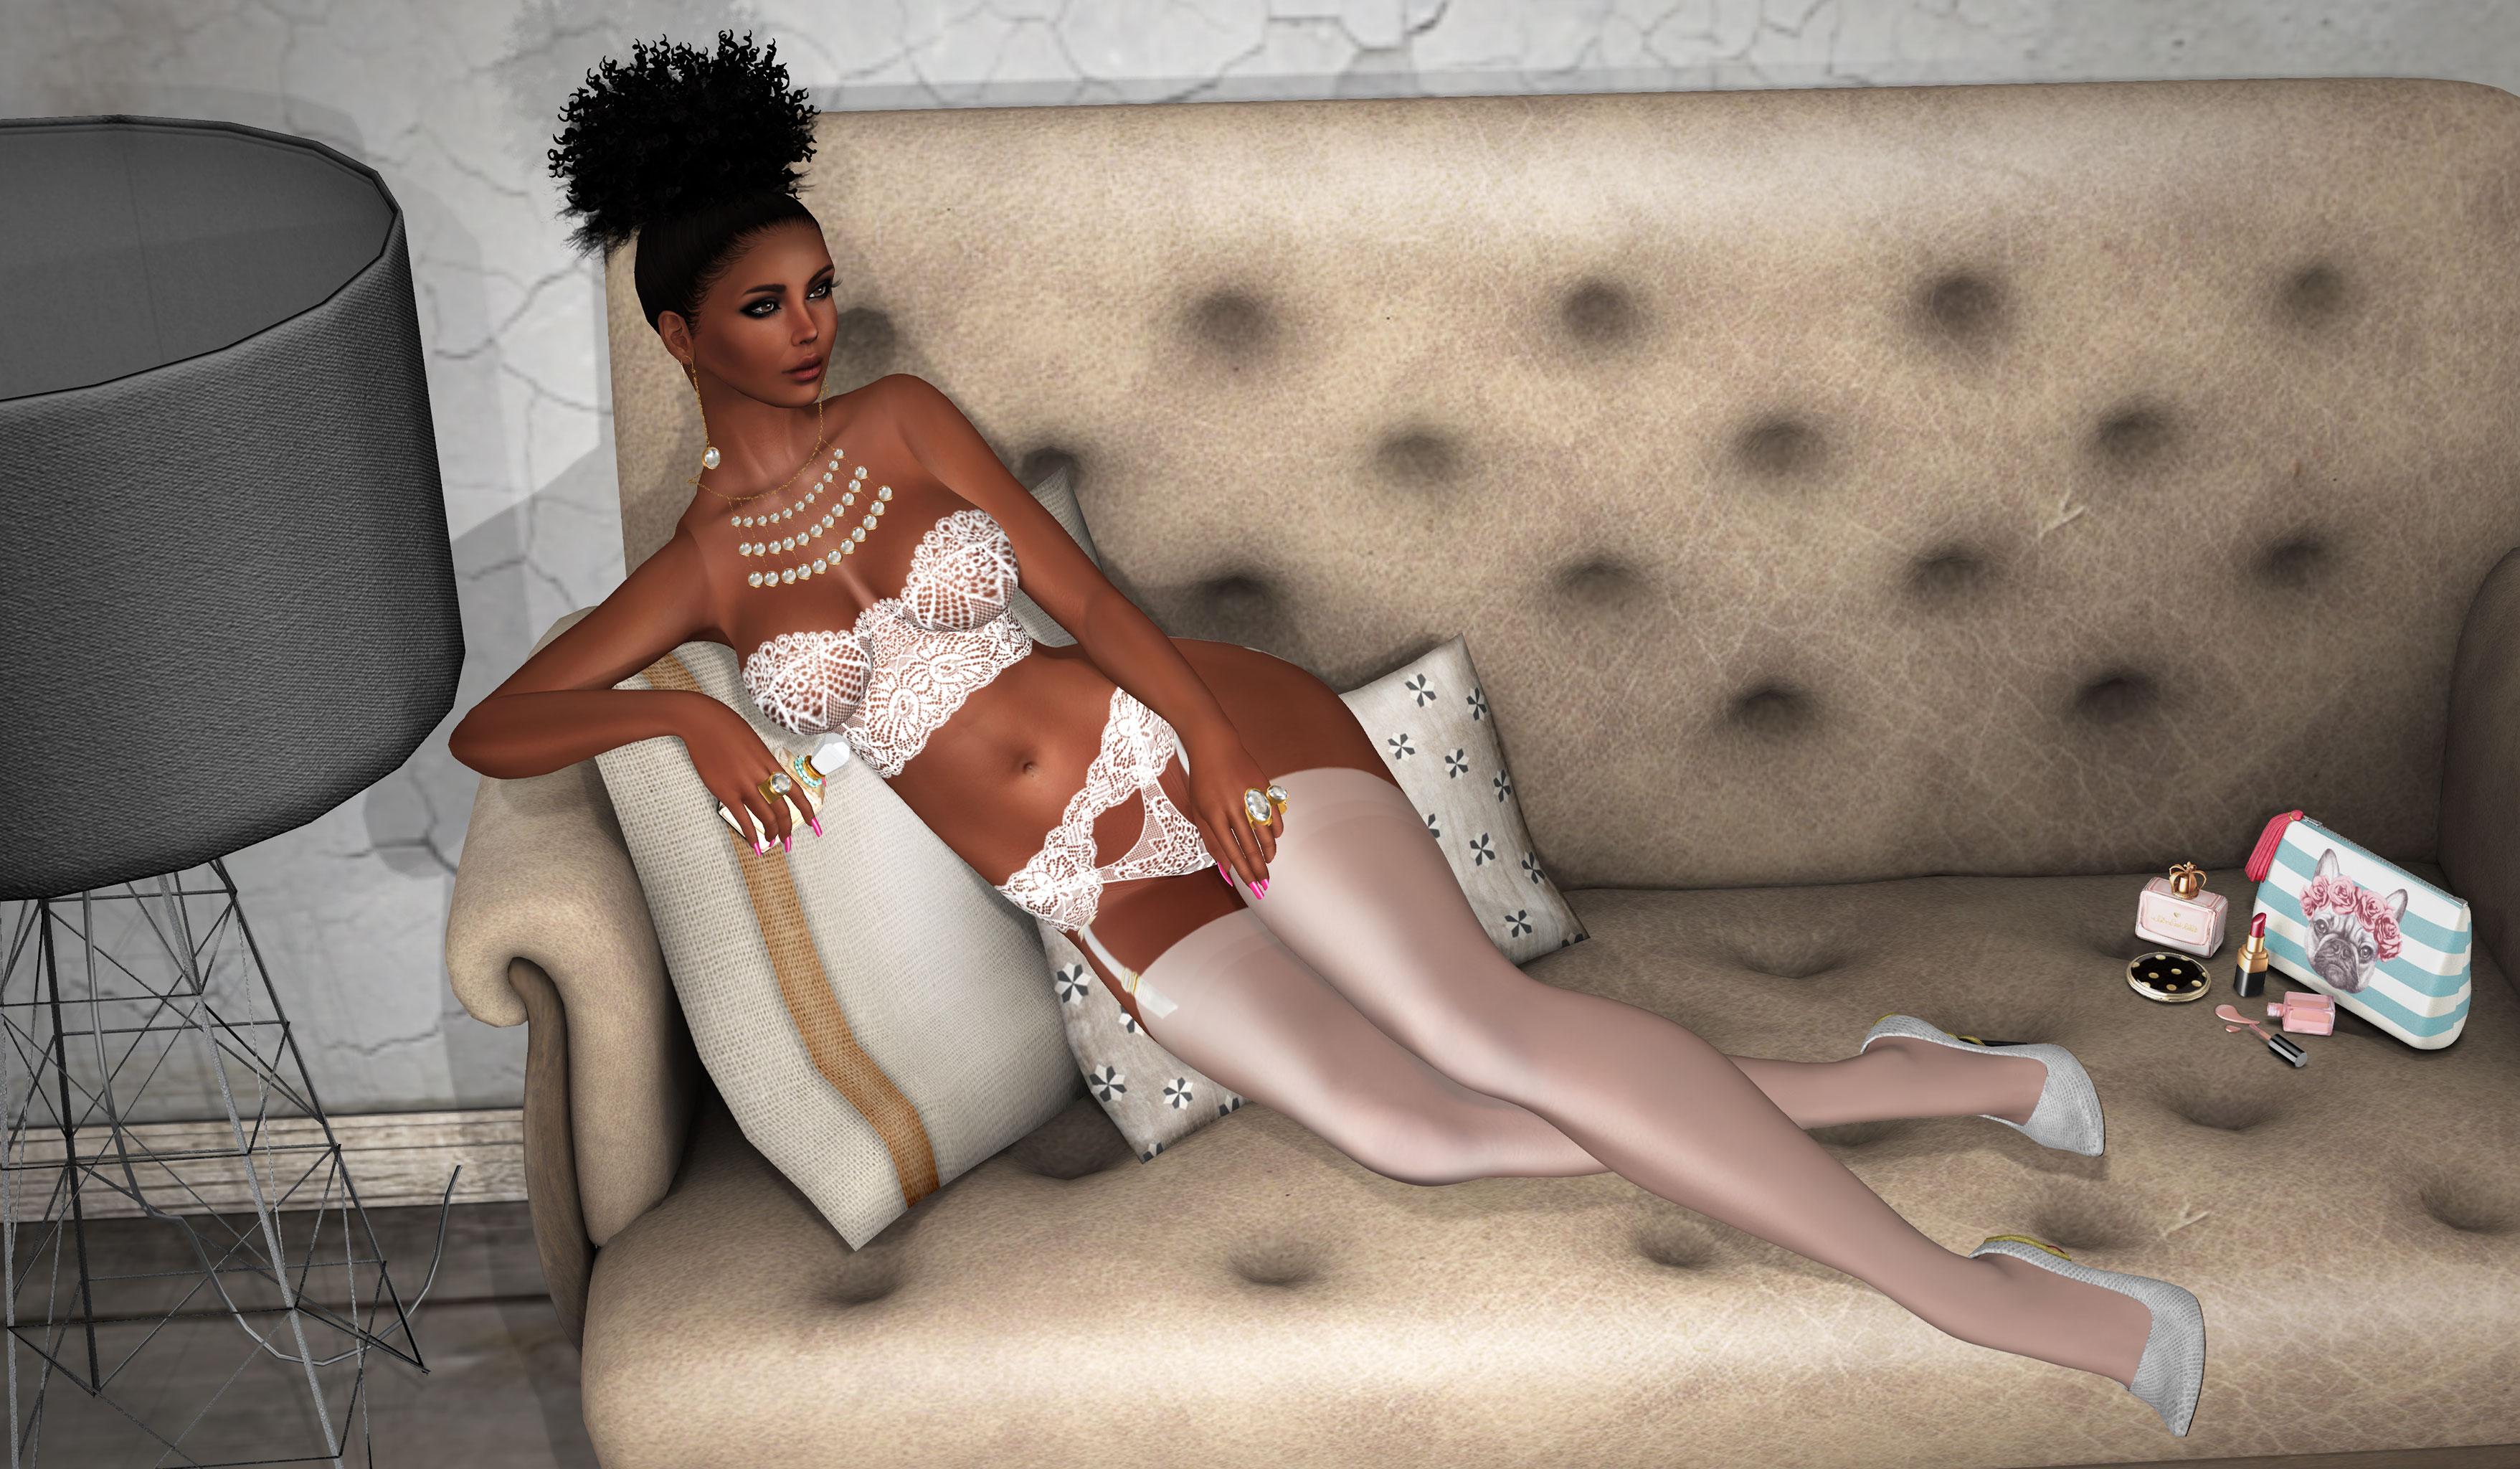 Freya_Belleza body update